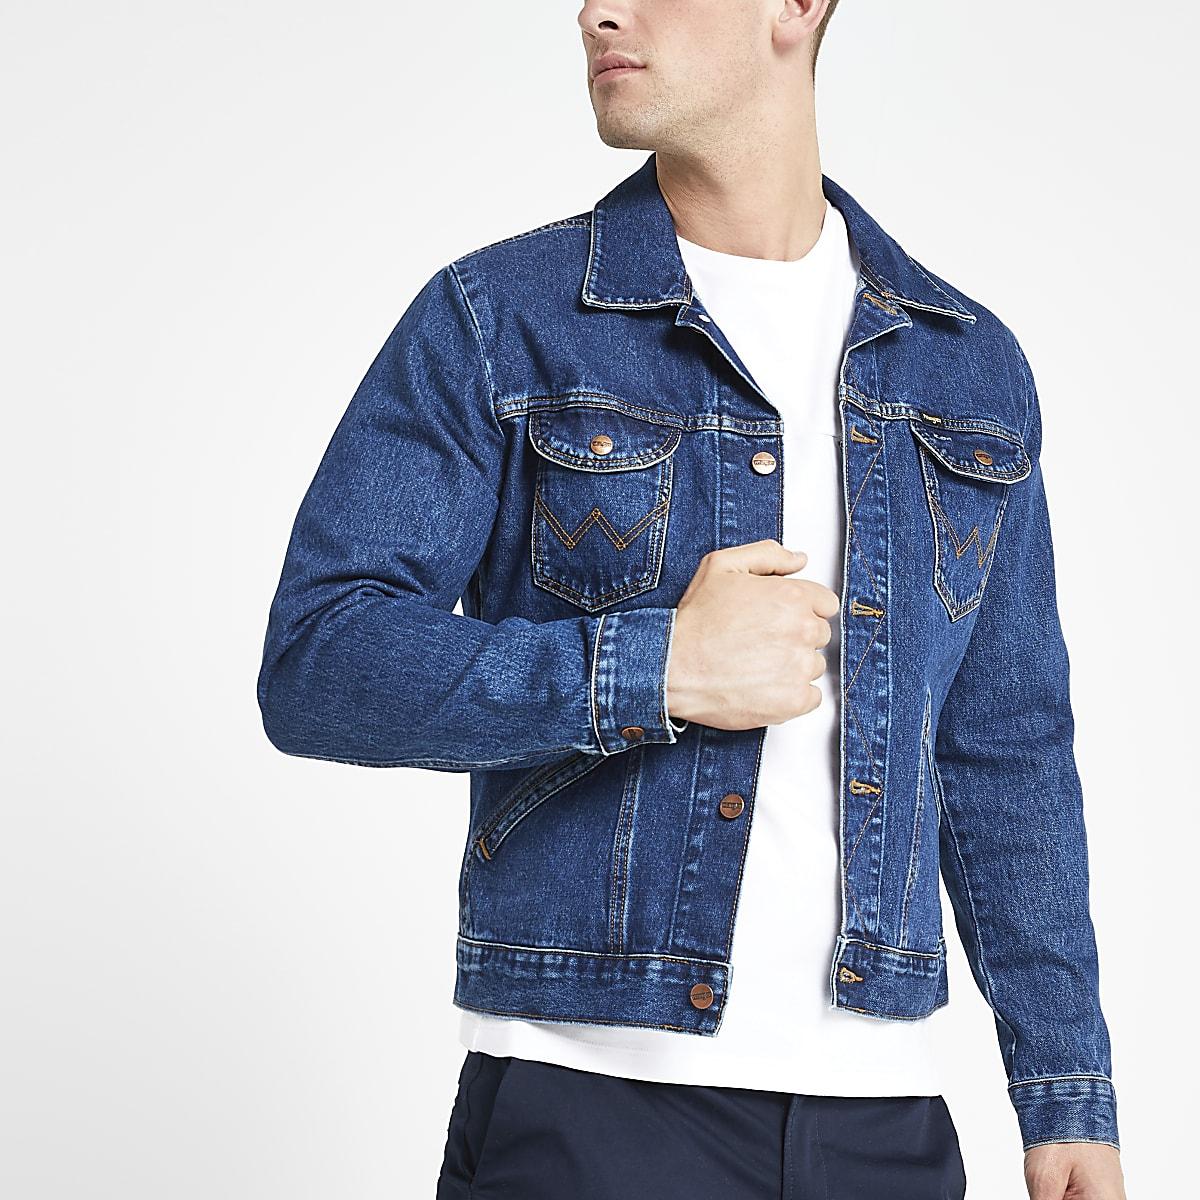 Wrangler dark blue denim jacket